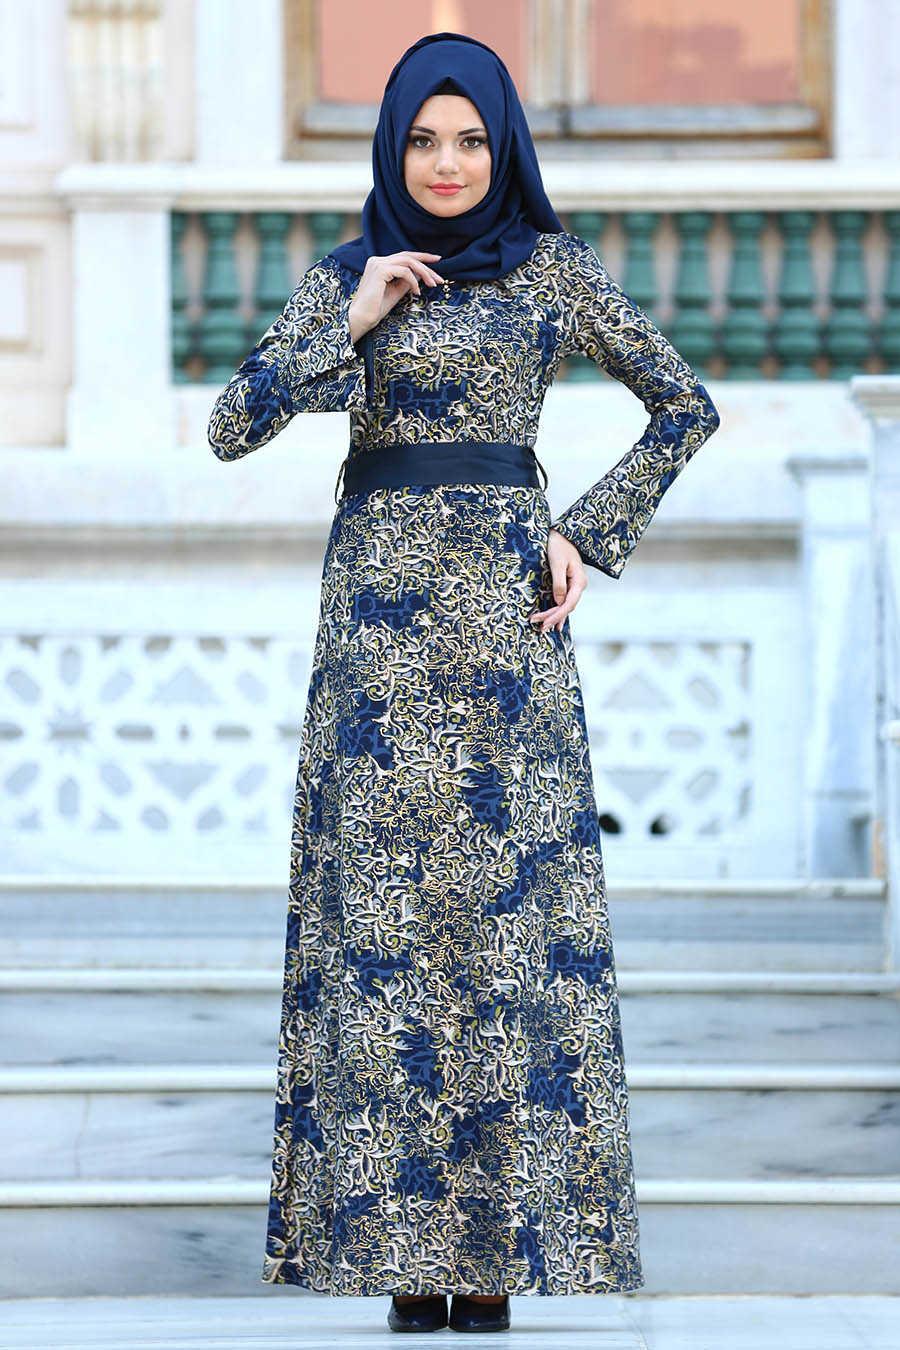 بالصور فساتين محجبات خروج , اروع فستان مناسب للخروج مخصص لكل بنت محجبة 4843 7